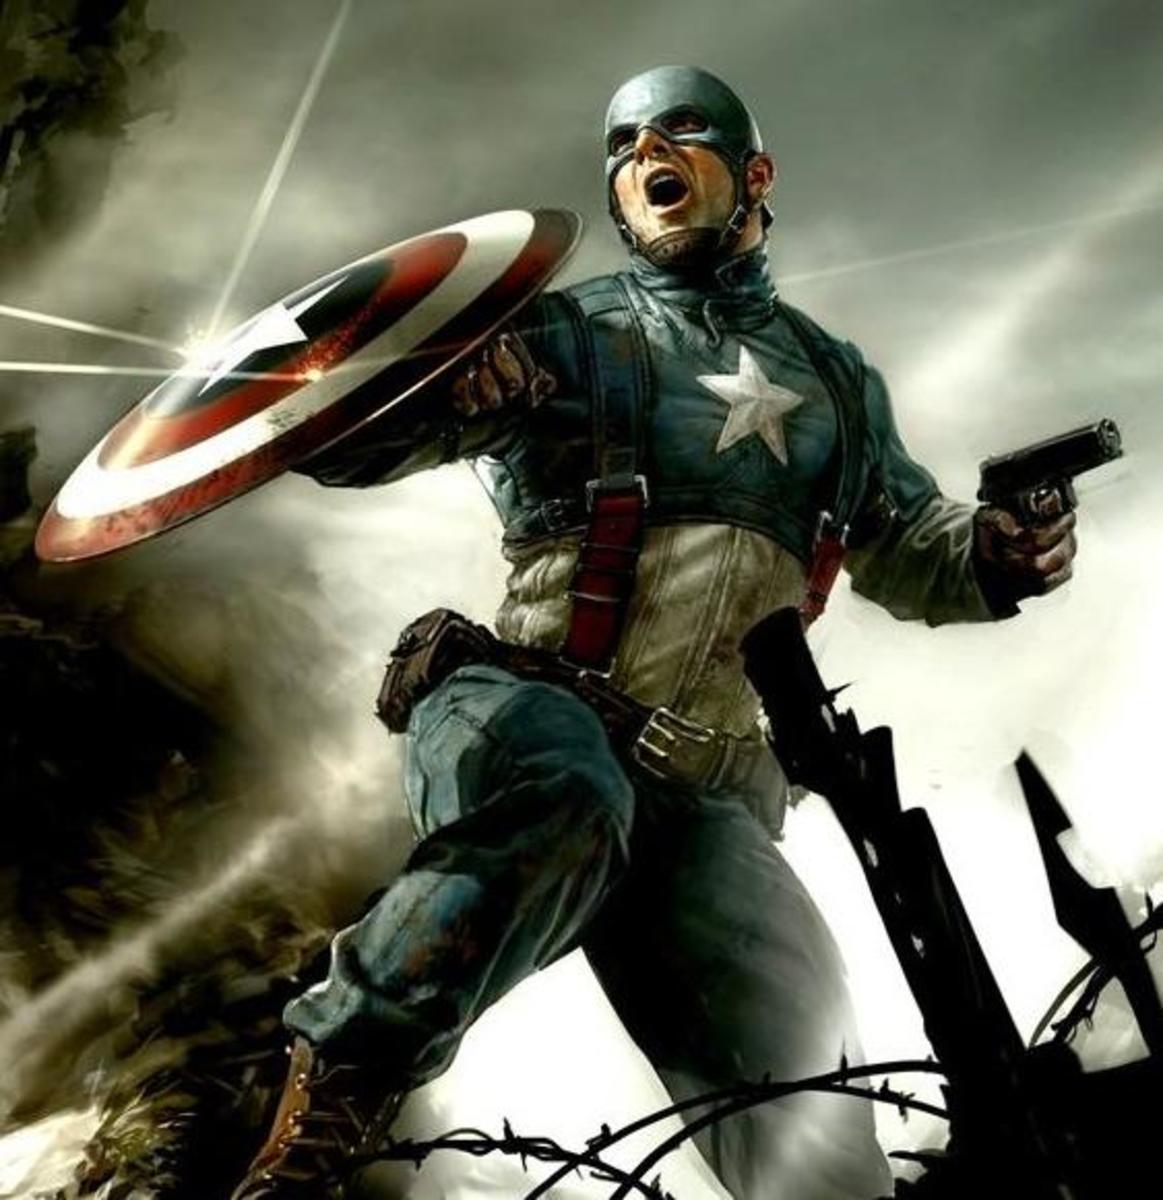 Captain America in World War II